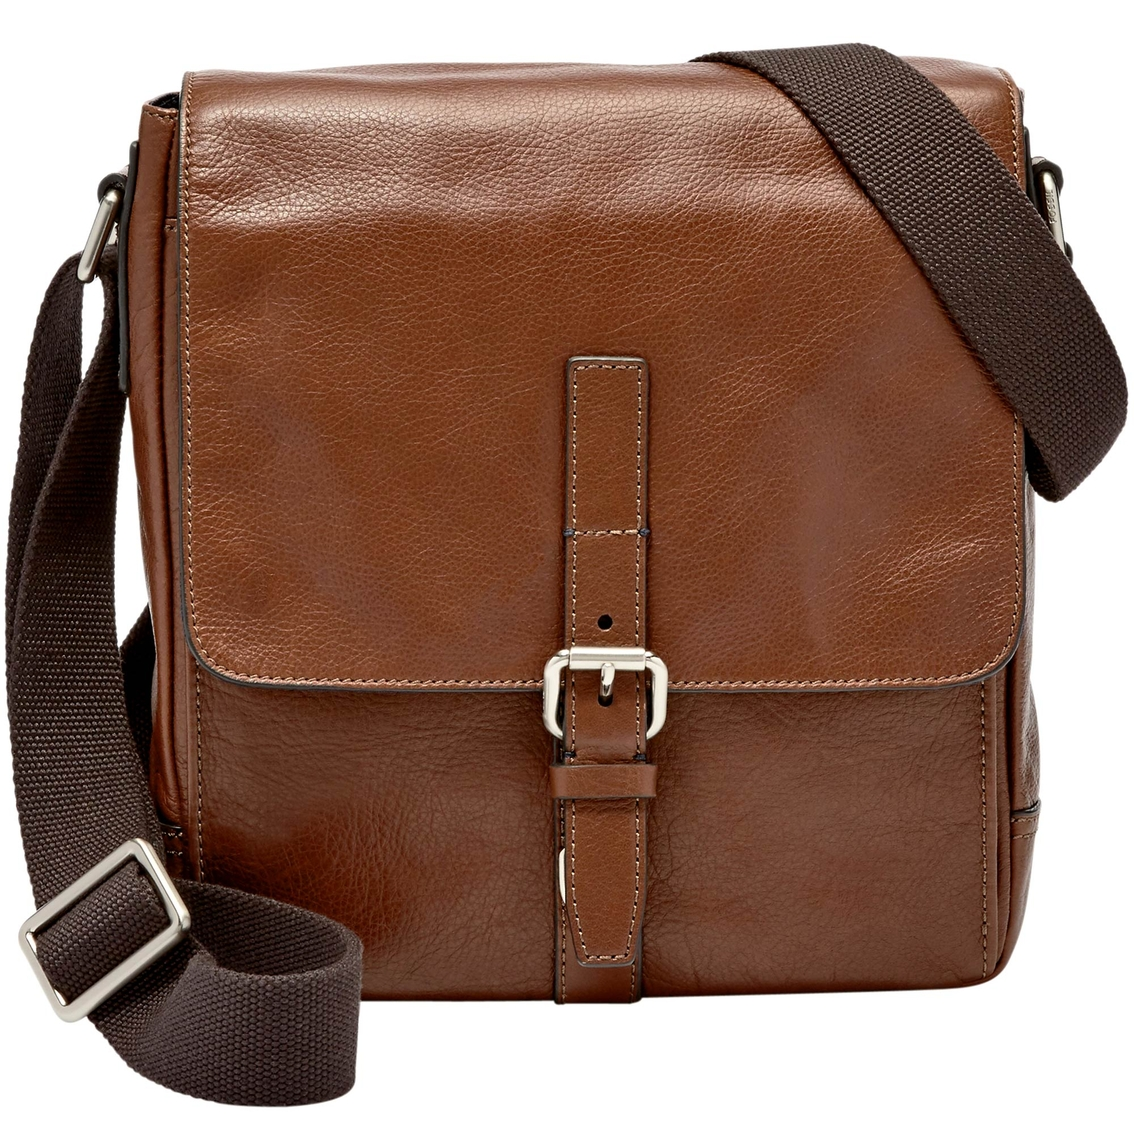 Fossil Davis City North South Messenger Bag   Business Cases   More   Shop The Exchange